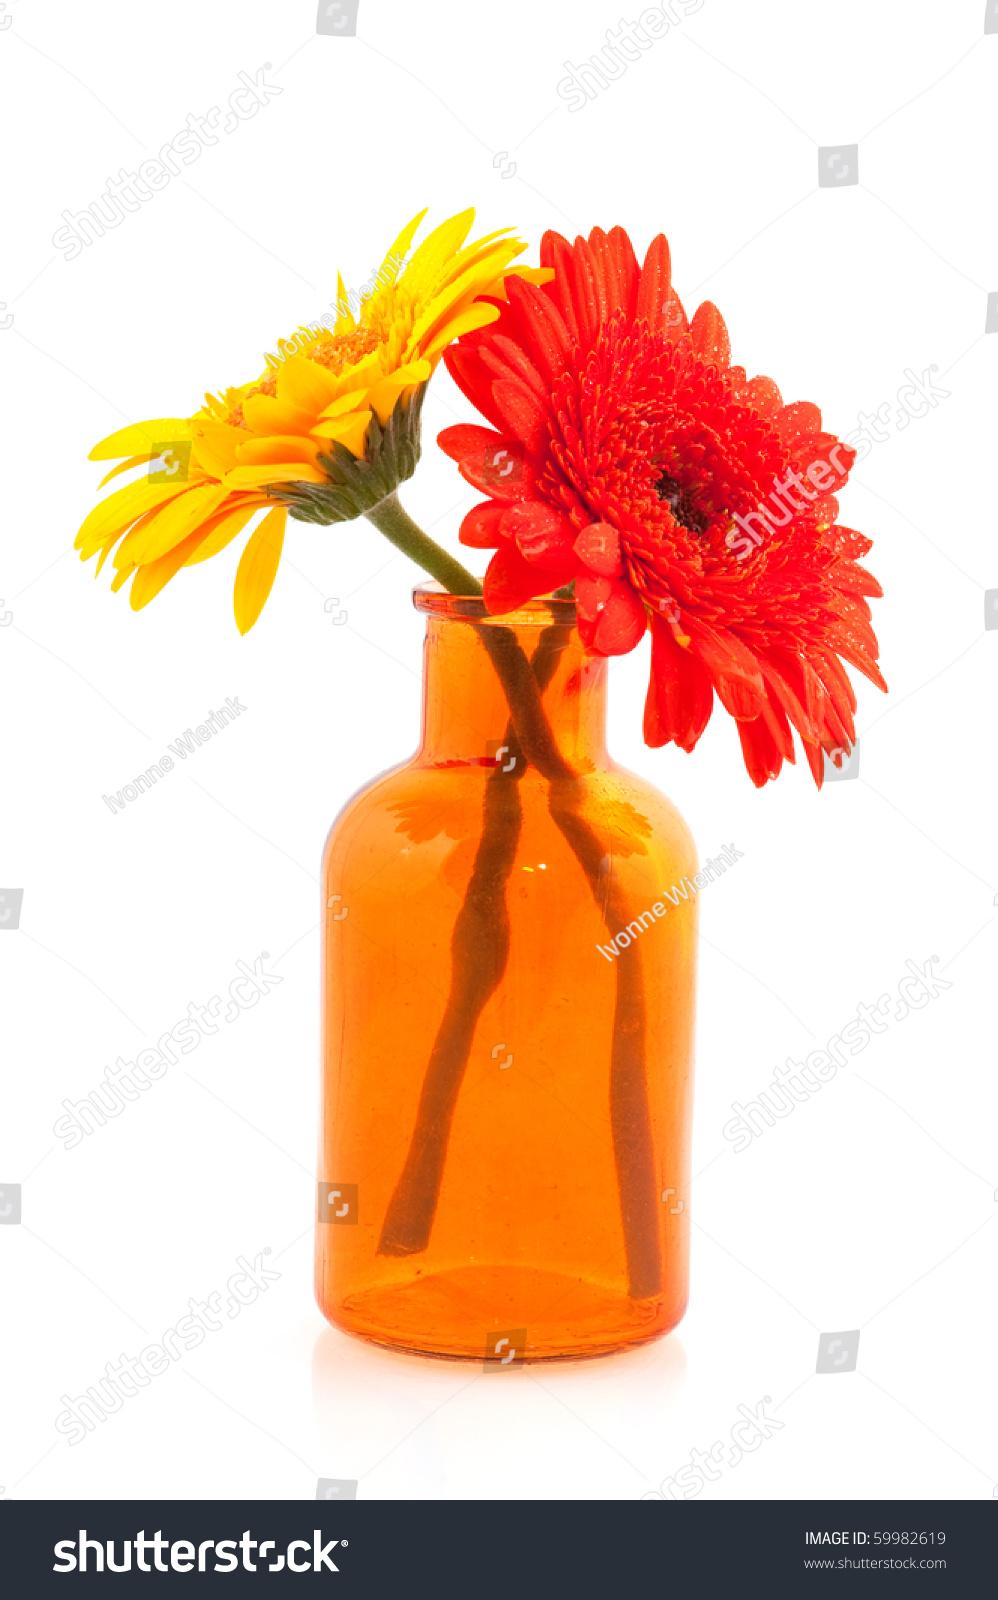 Yellow Orange Gerber Flower Glass Vase Stock Photo ...